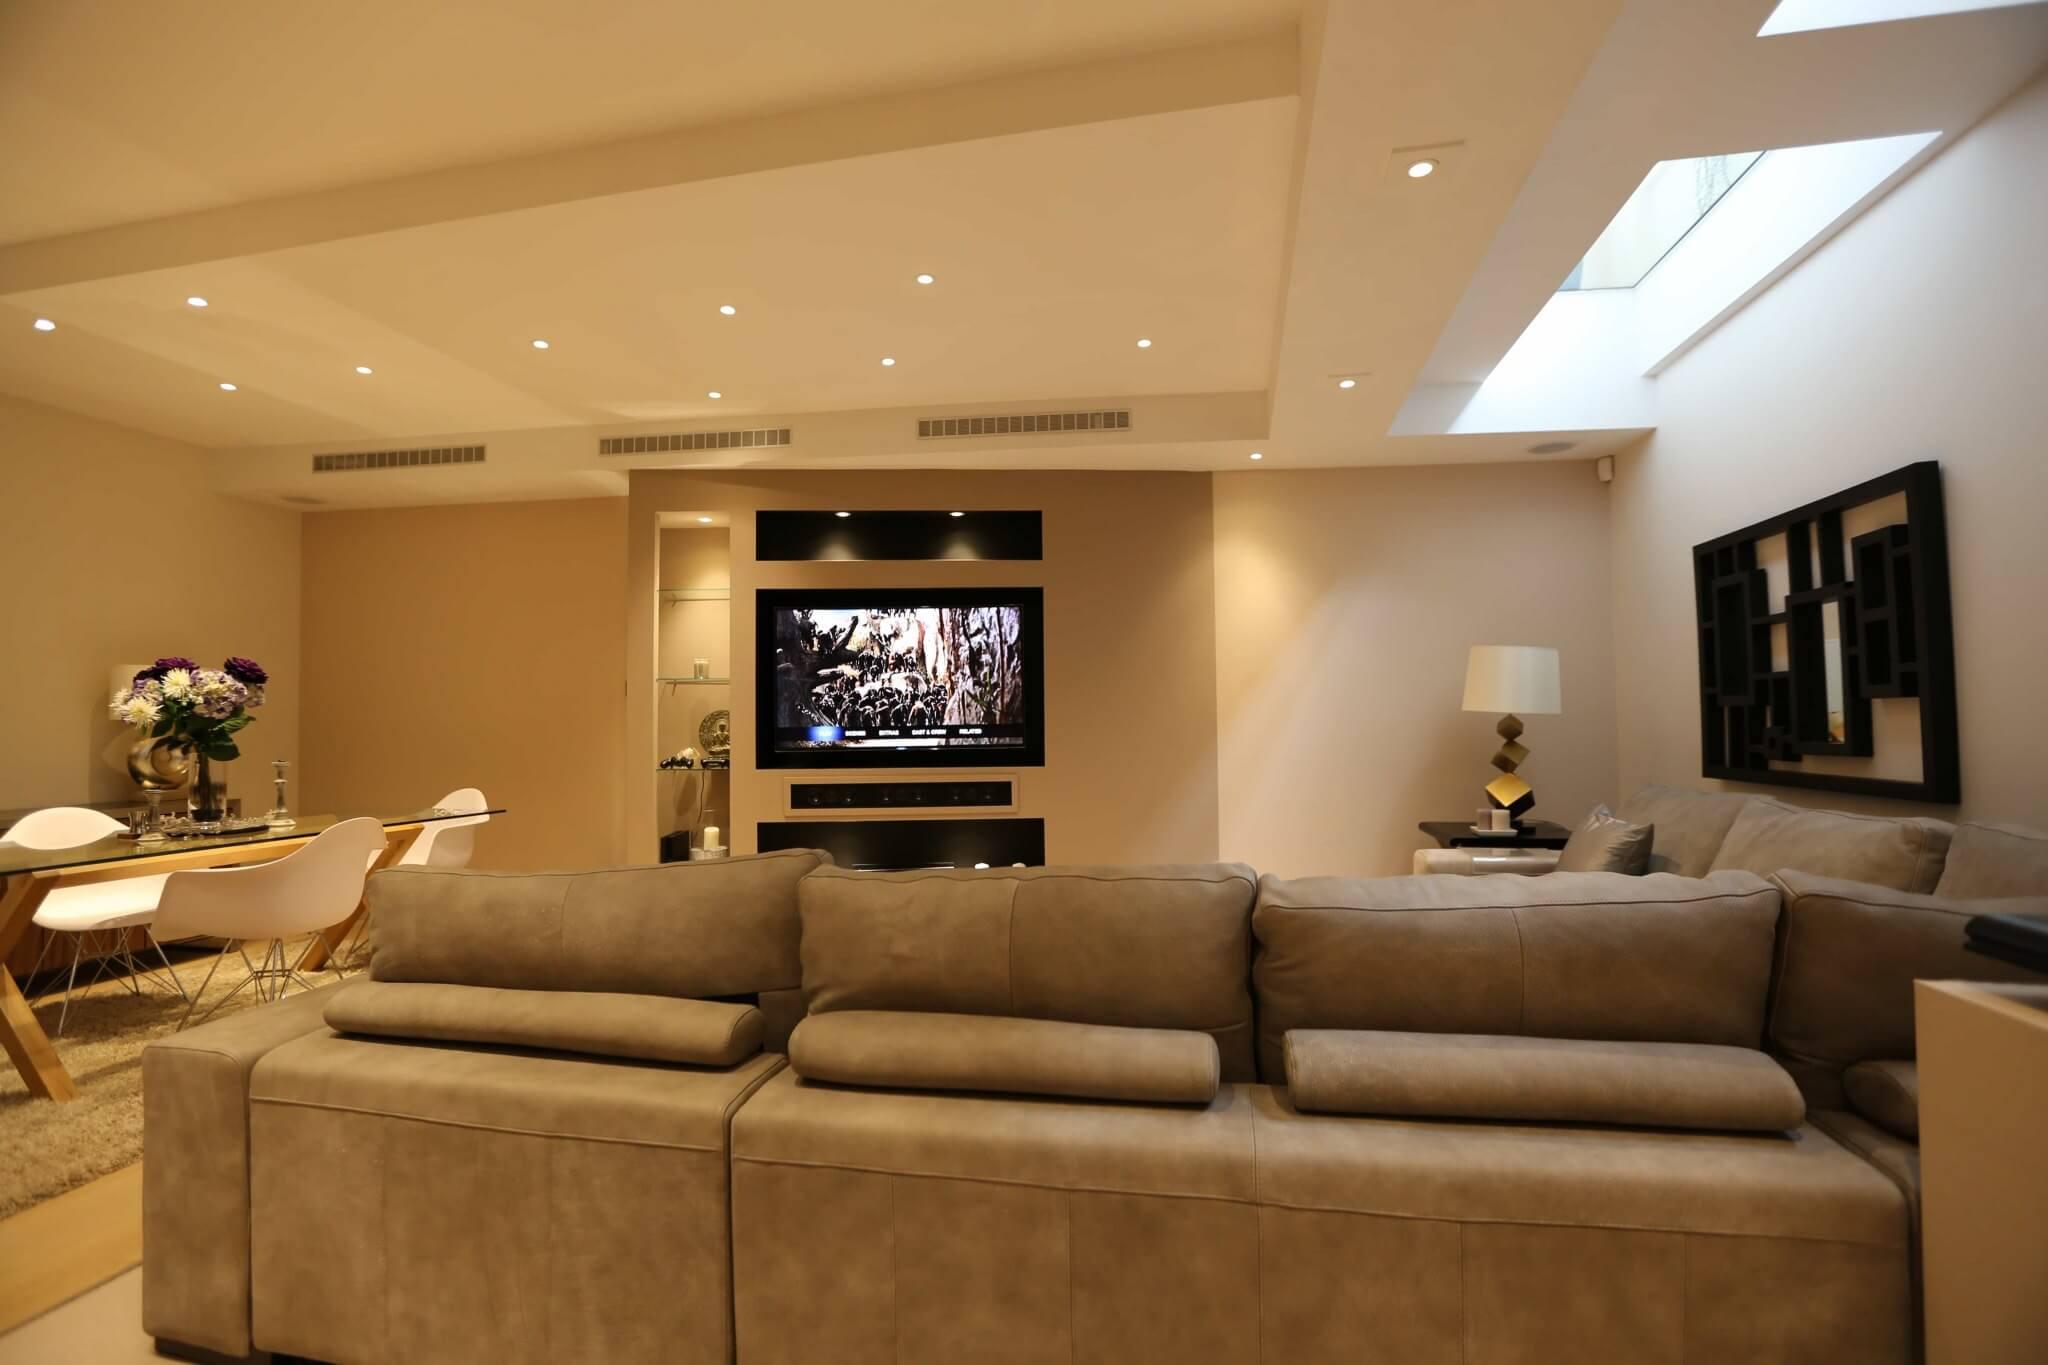 Living Room Home Cinema in Kensington, London